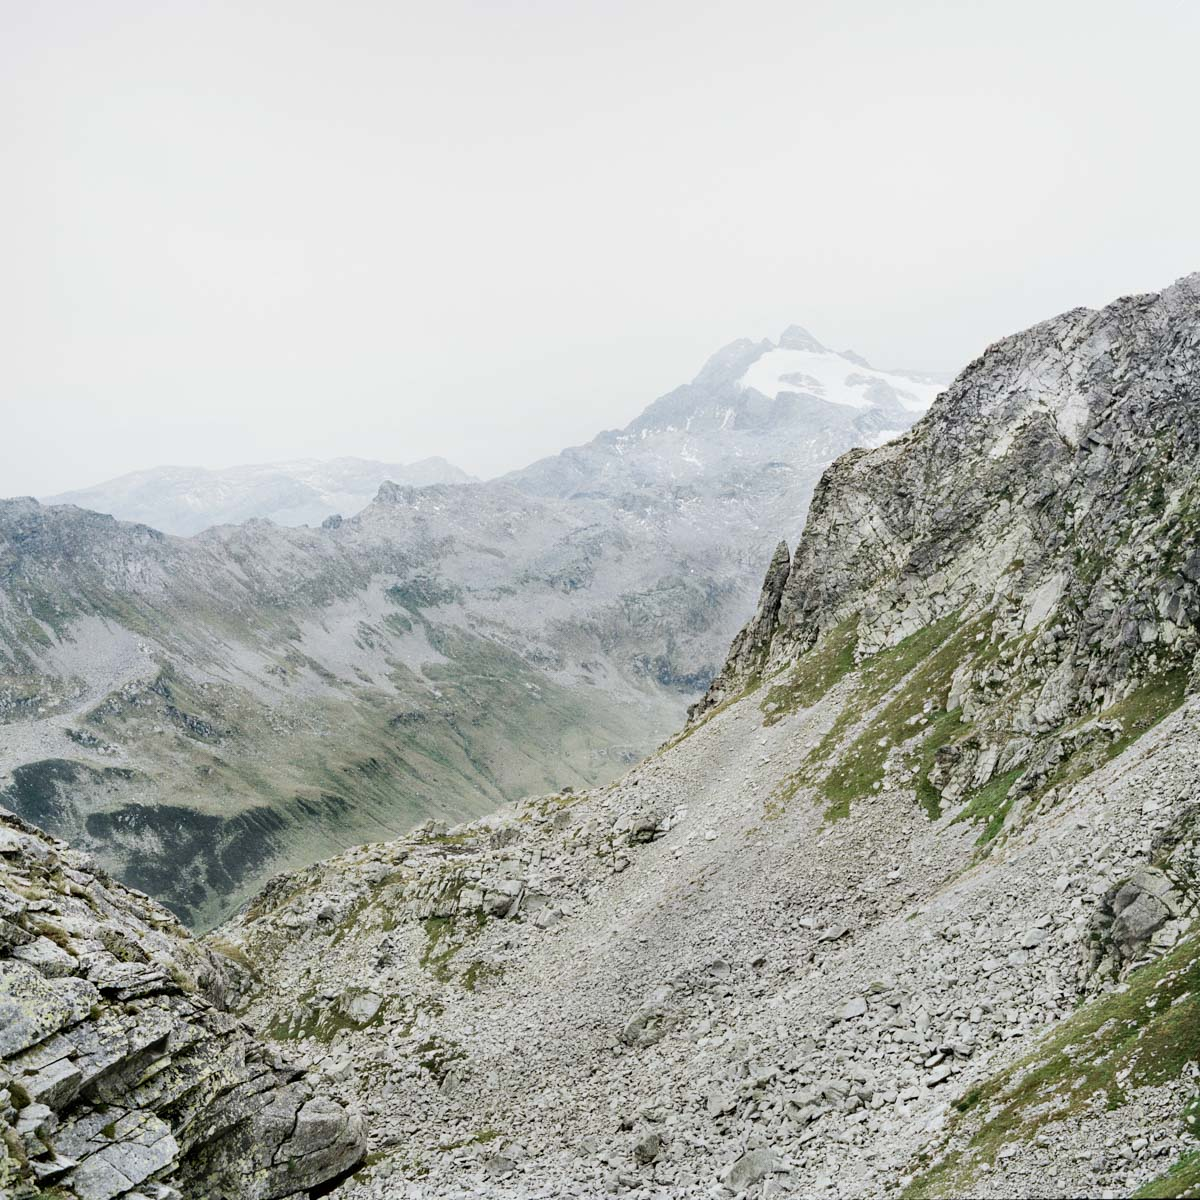 splügen pass berge schnee baumgrenze nebel wandern gipfel horizont landschaft italien jörn strojny